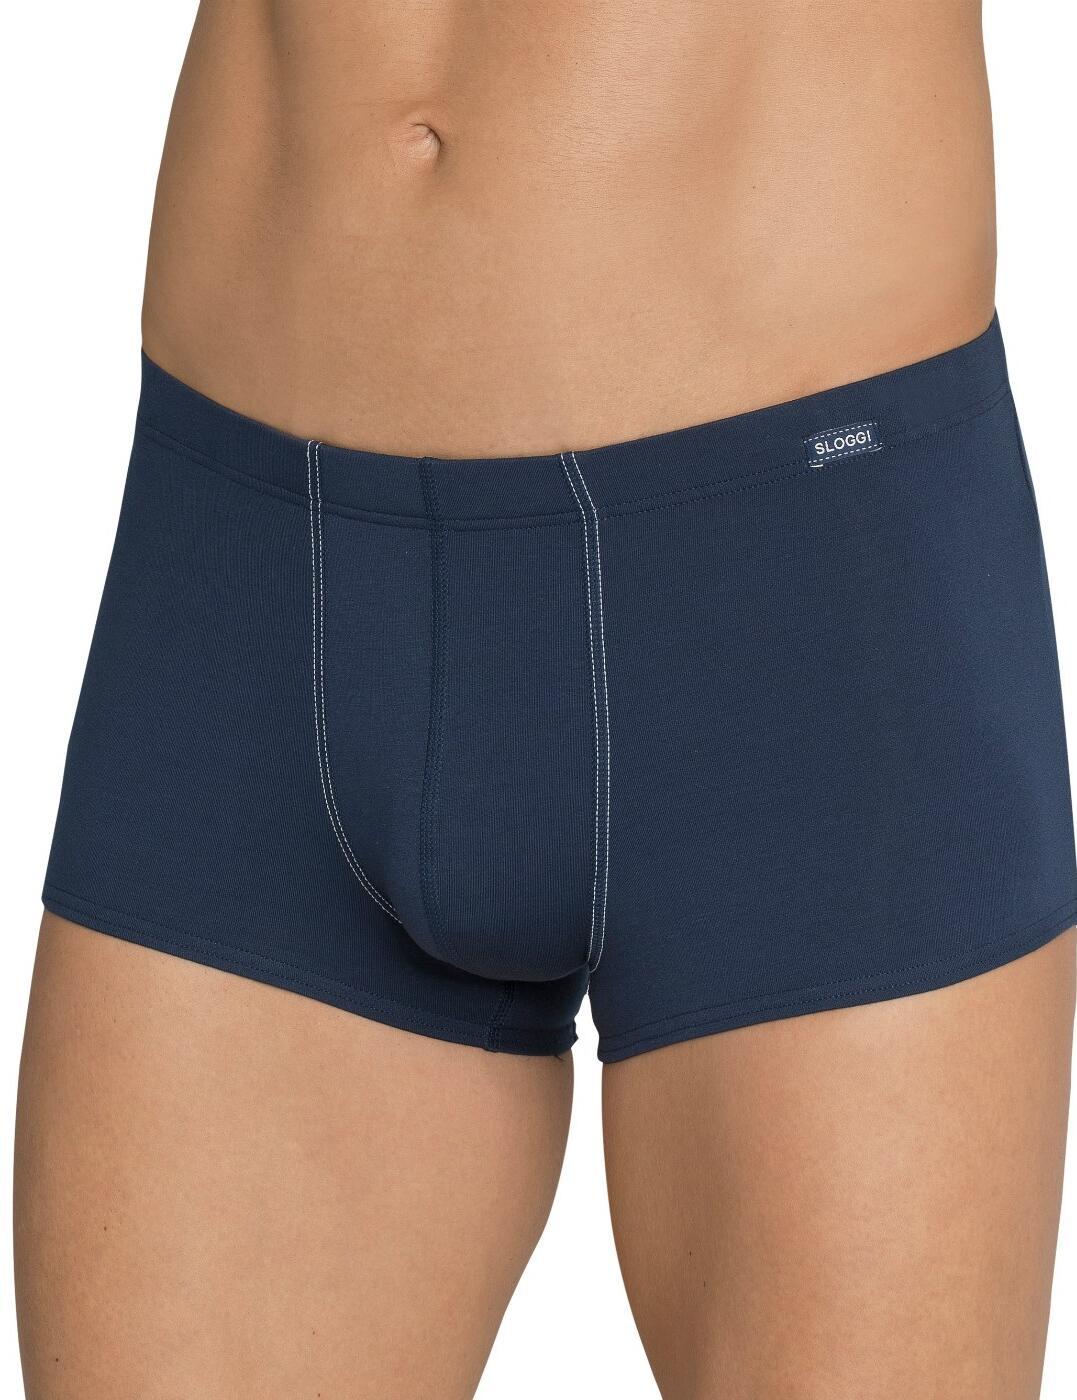 10167208 Sloggi Men Basic Soft Hipster - 10167208 Night Blue